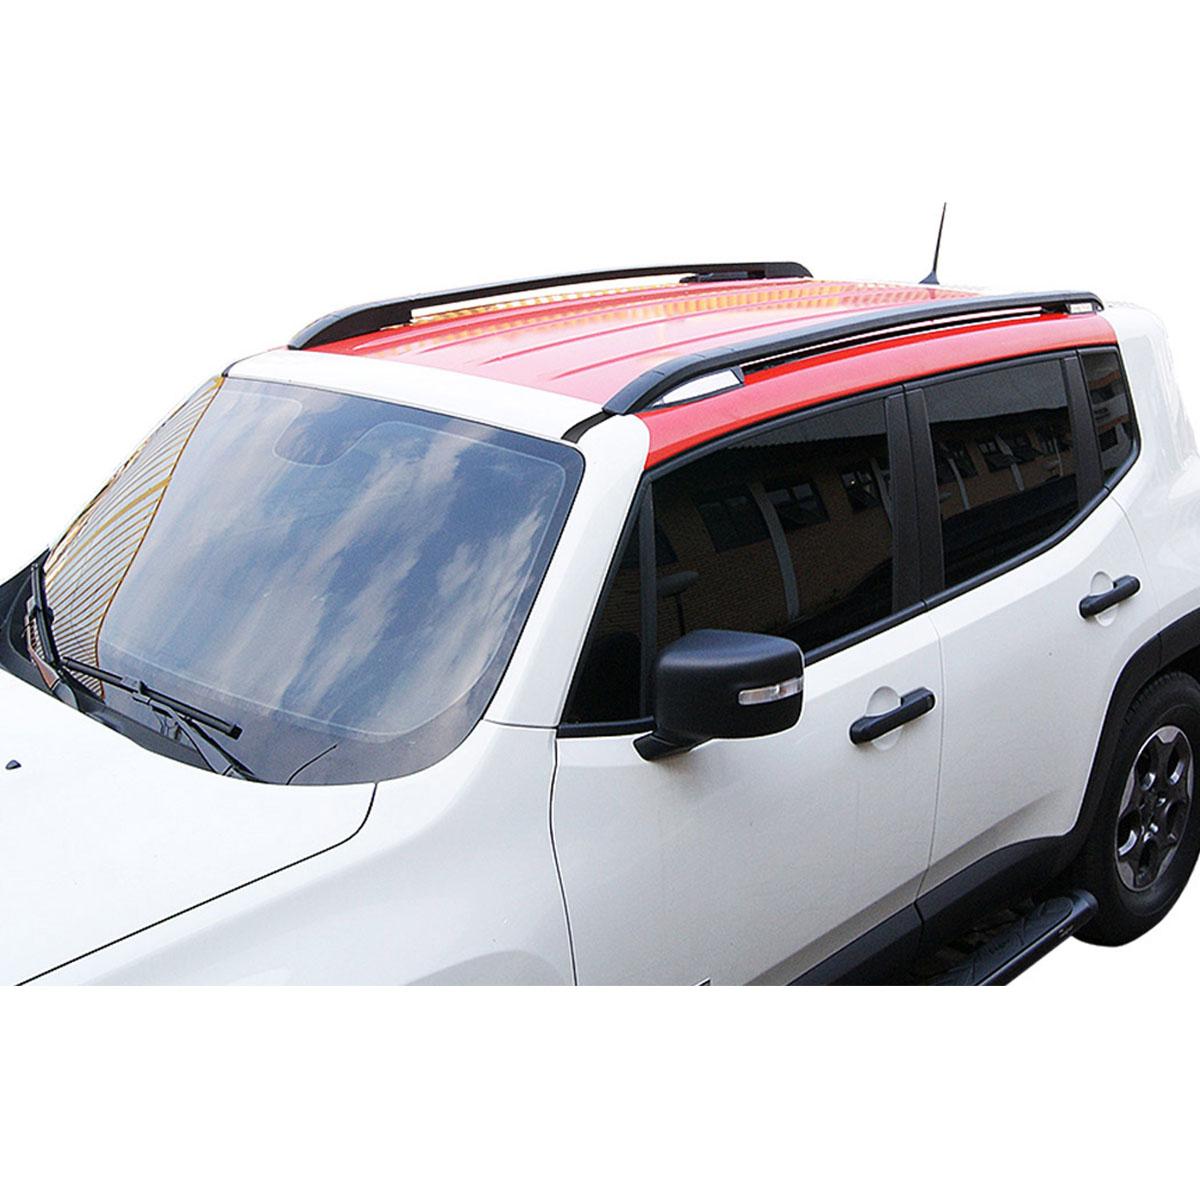 Longarina rack de teto Jeep Renegade 2016 2017 alumínio cor preta